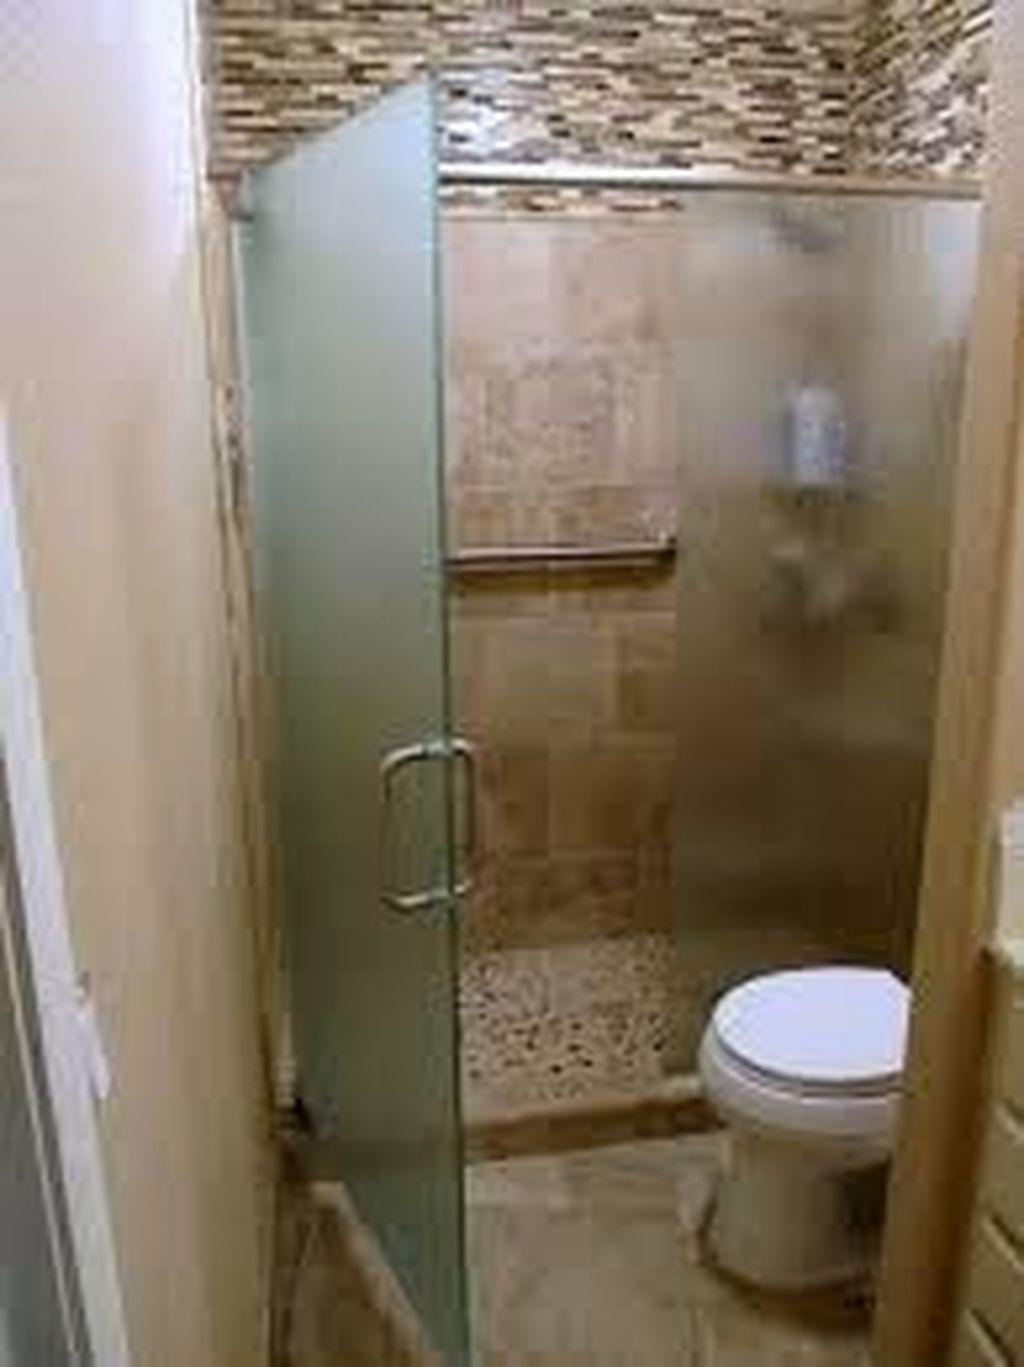 Marvelous Wooden Shower Floor Tiles Designs Ideas For Bathroom Remodel 06